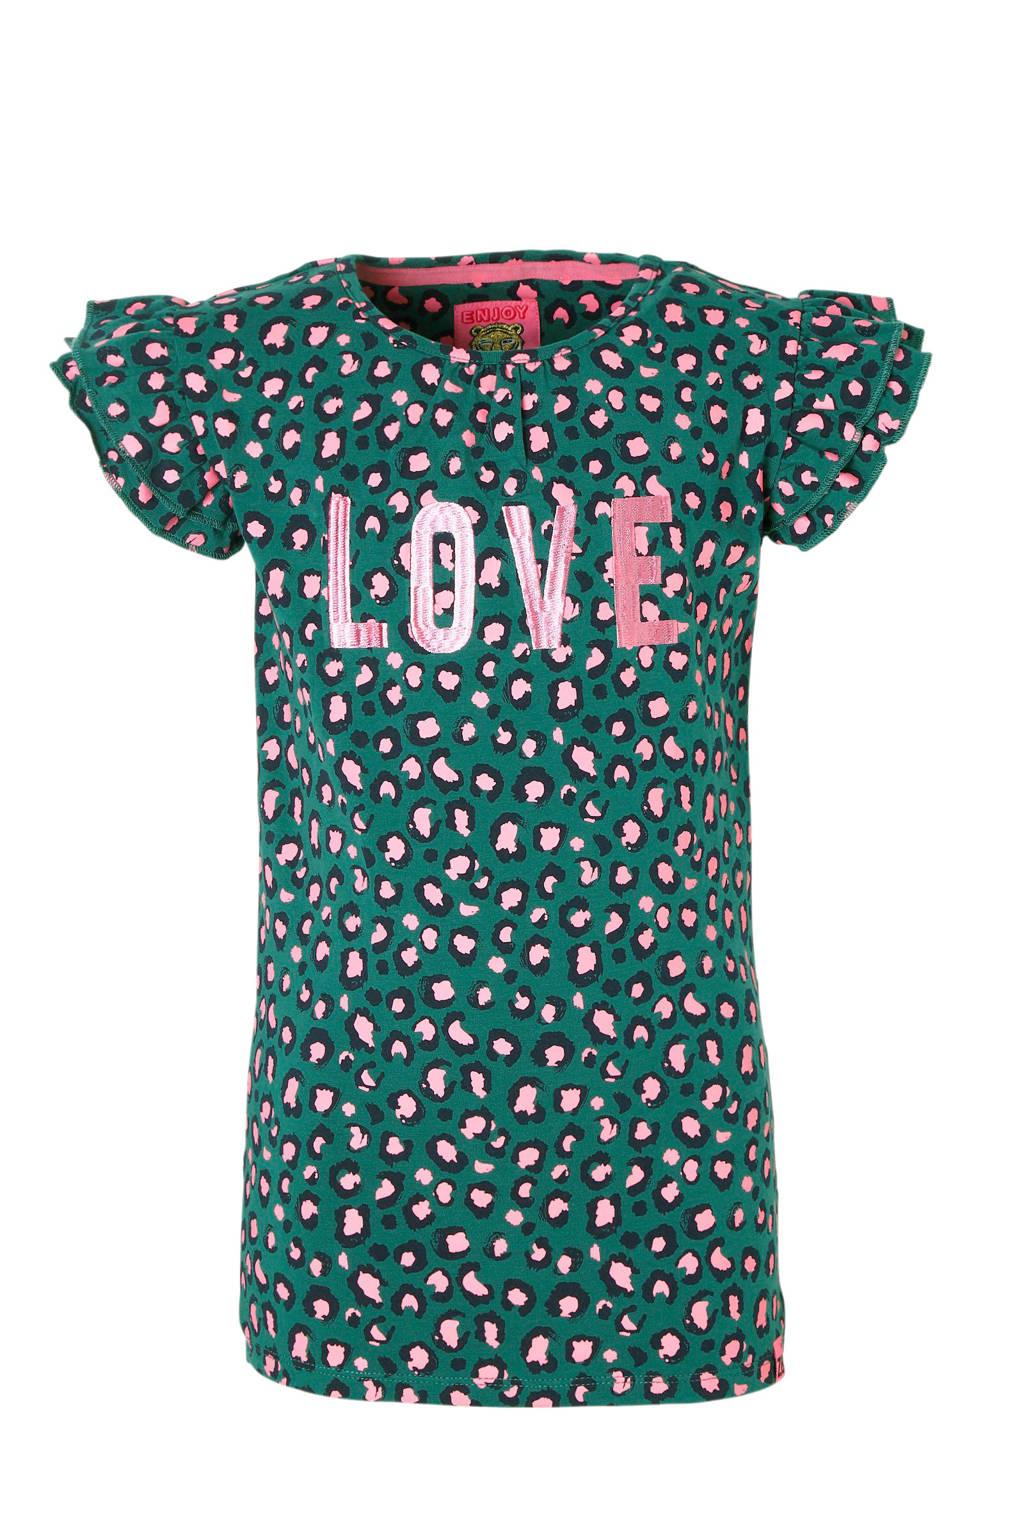 Z8 T-shirt Sanne met panterprint en tekst groen, Groen